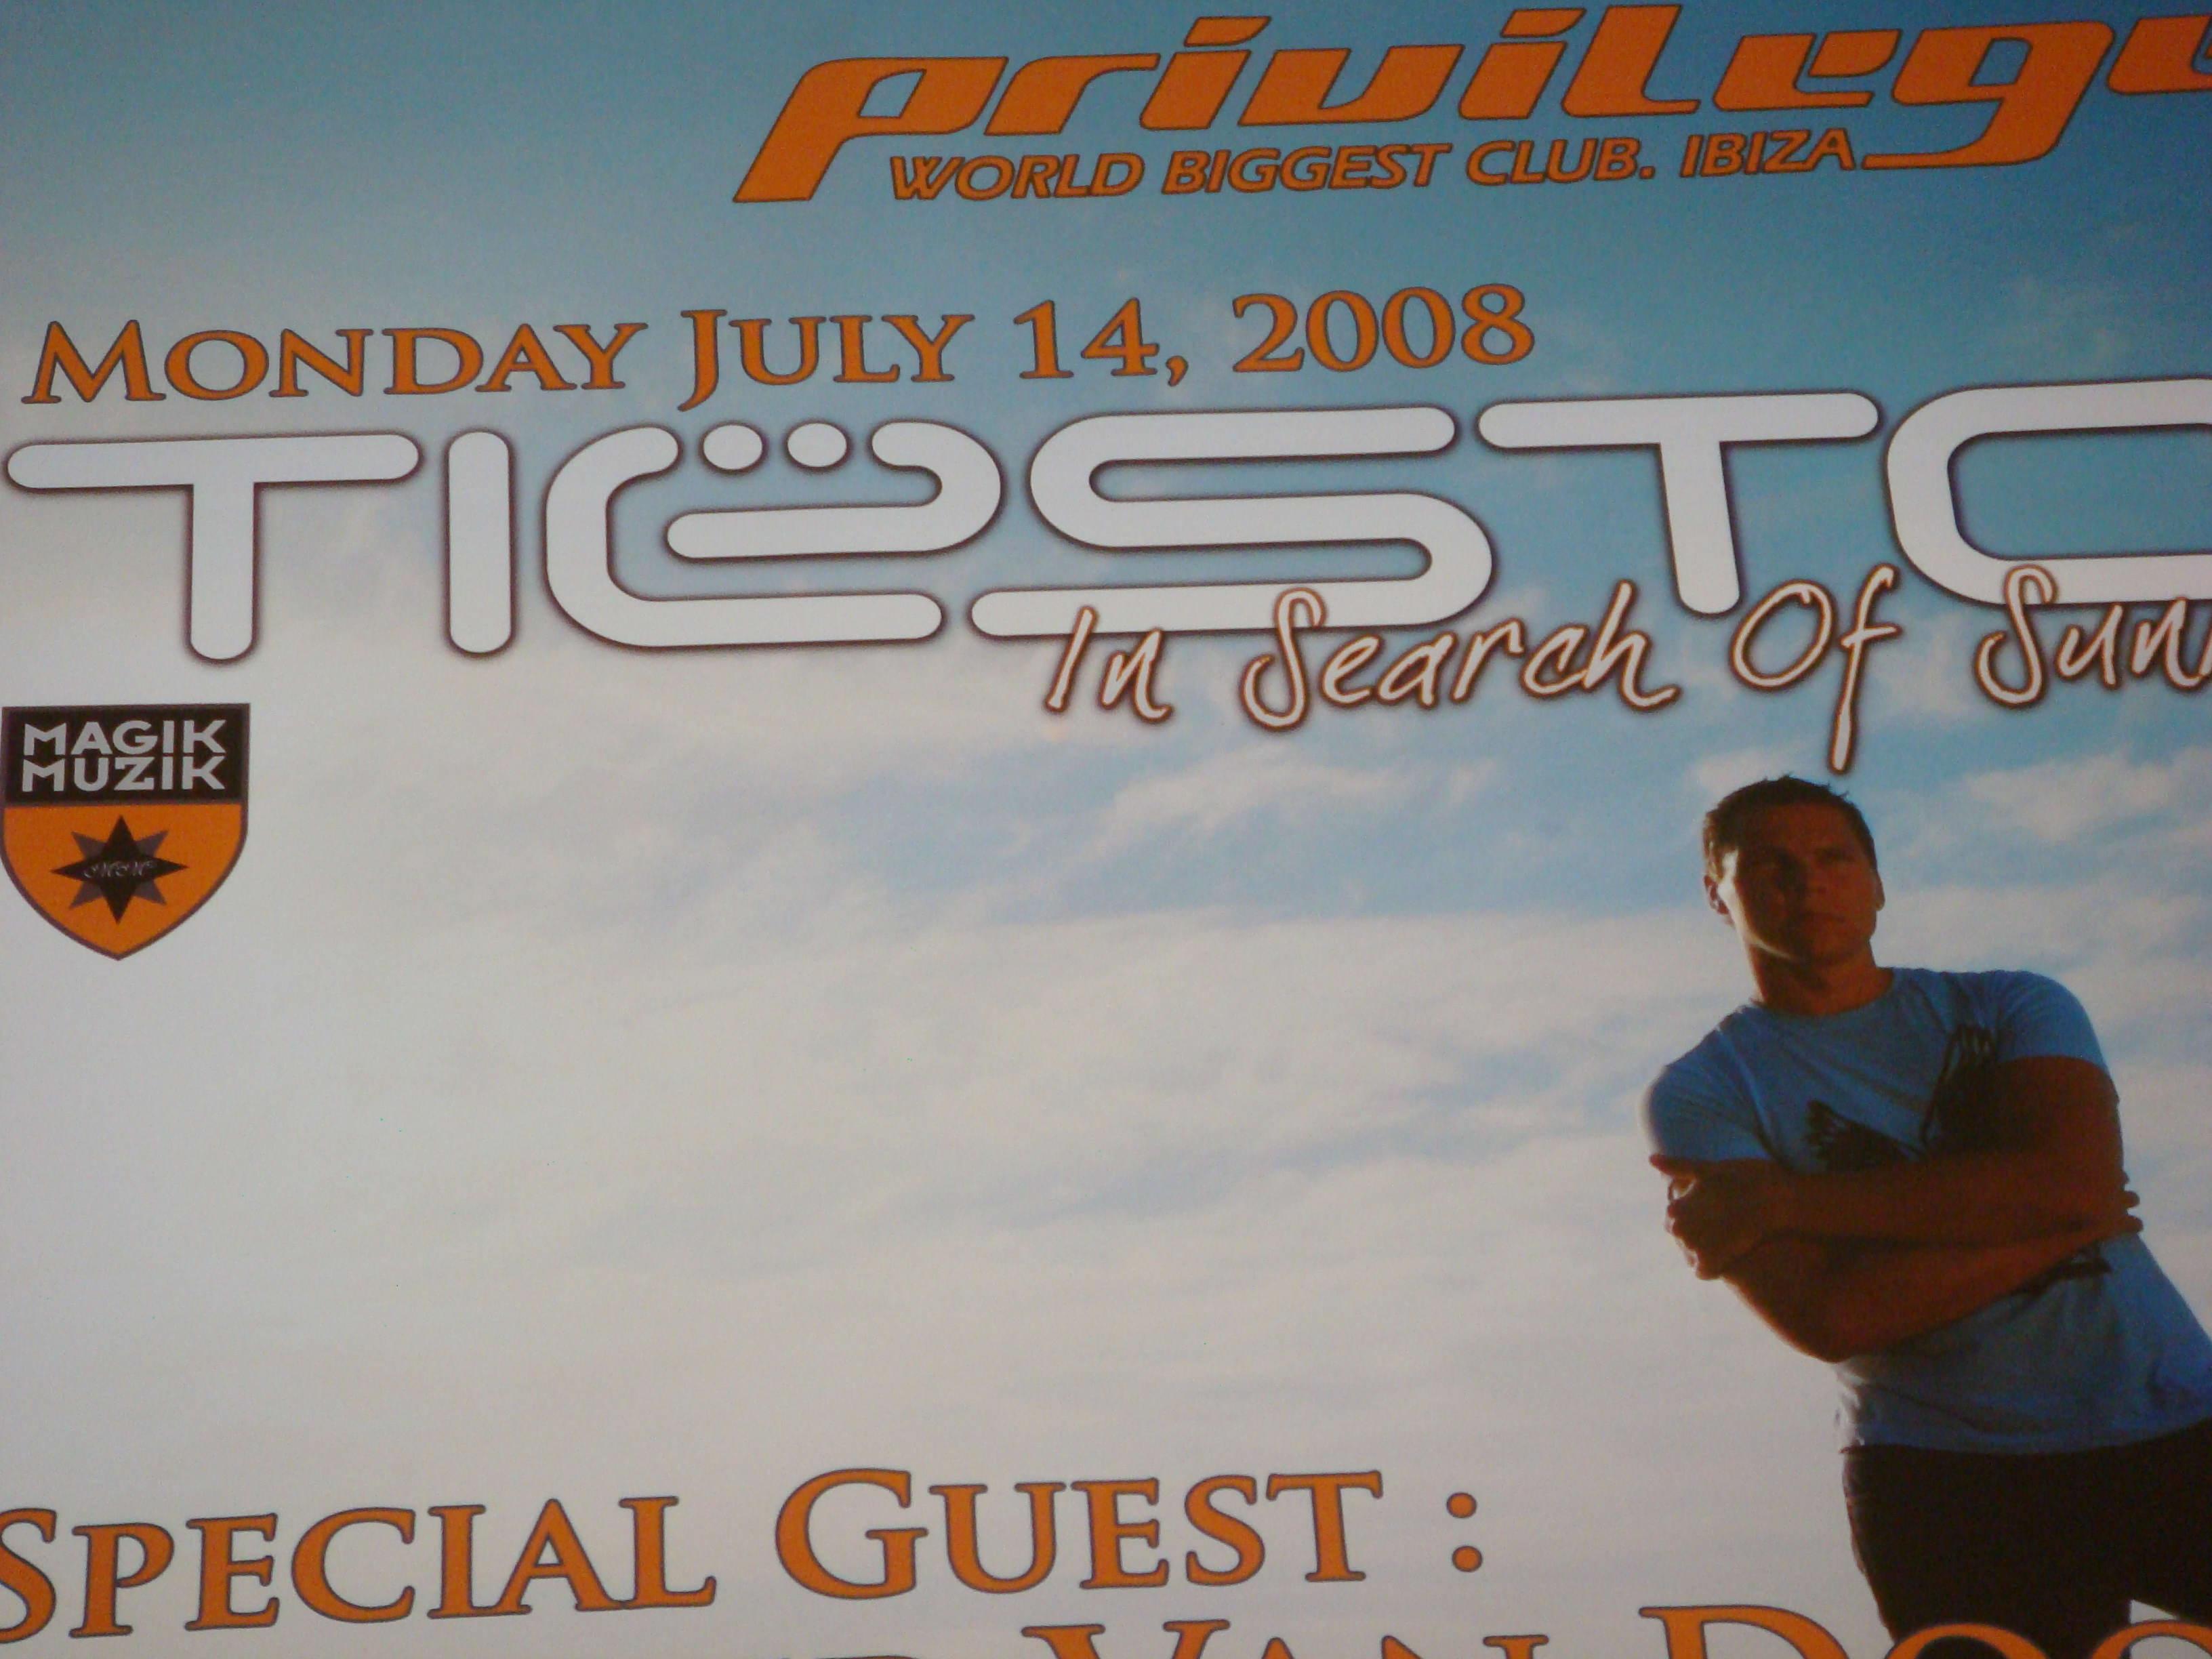 Tiesto at Privilege Ibiza 14 july 2008 Poster